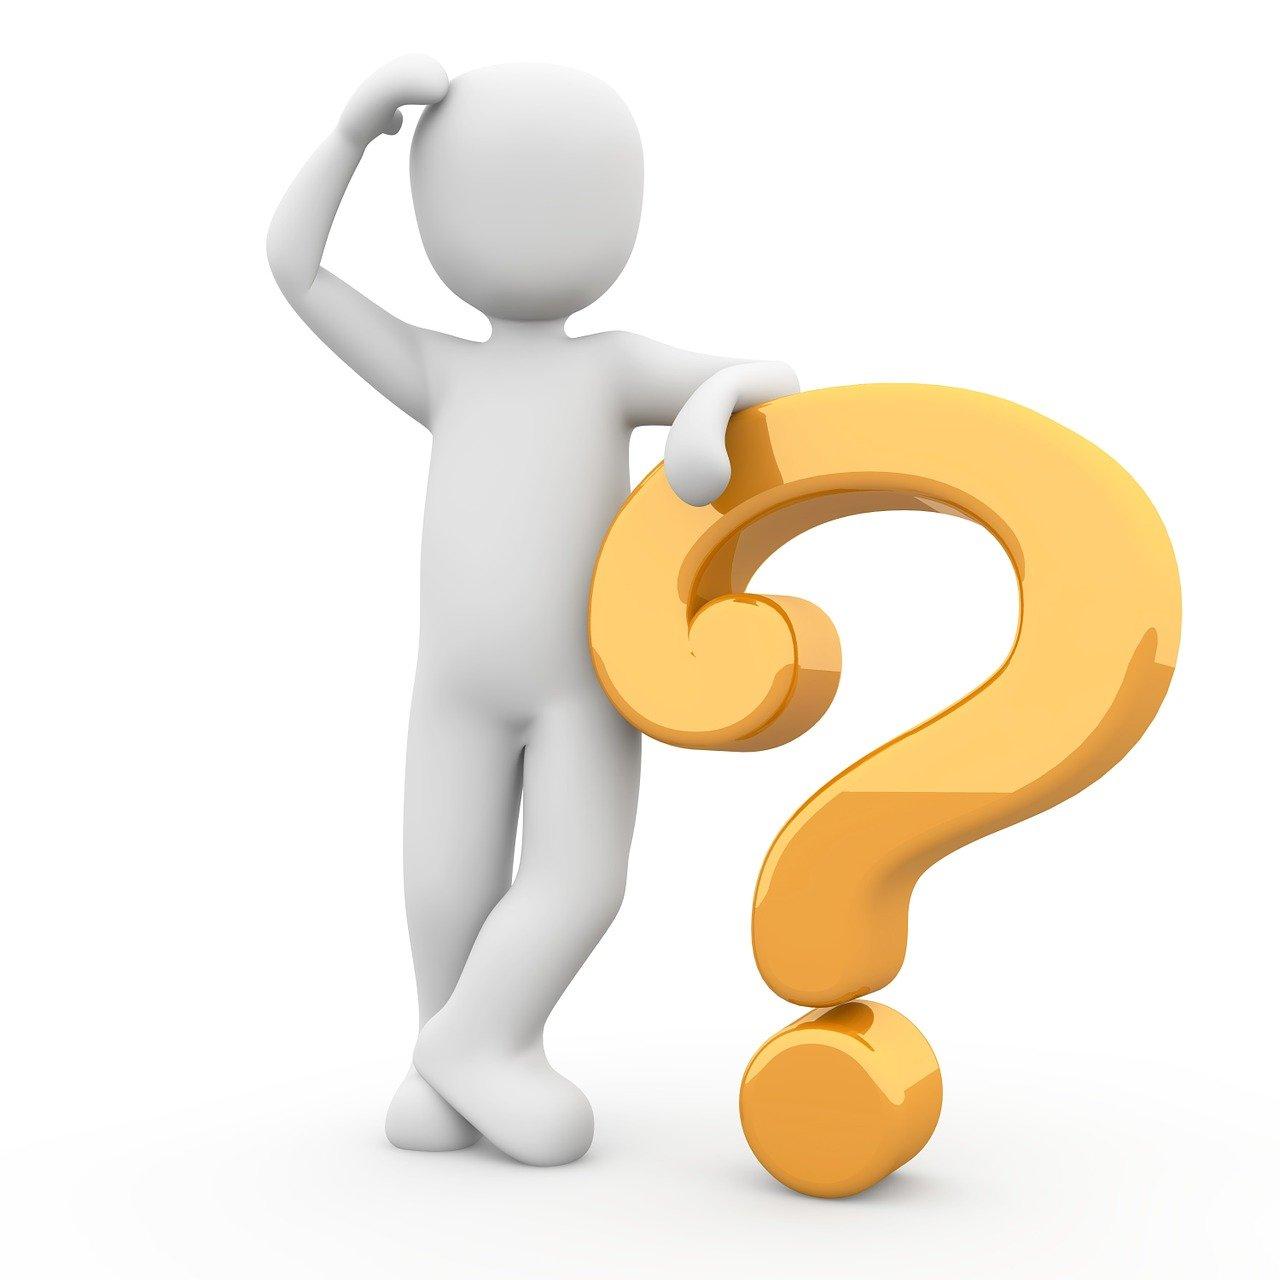 question mark, question, response-1019993.jpg